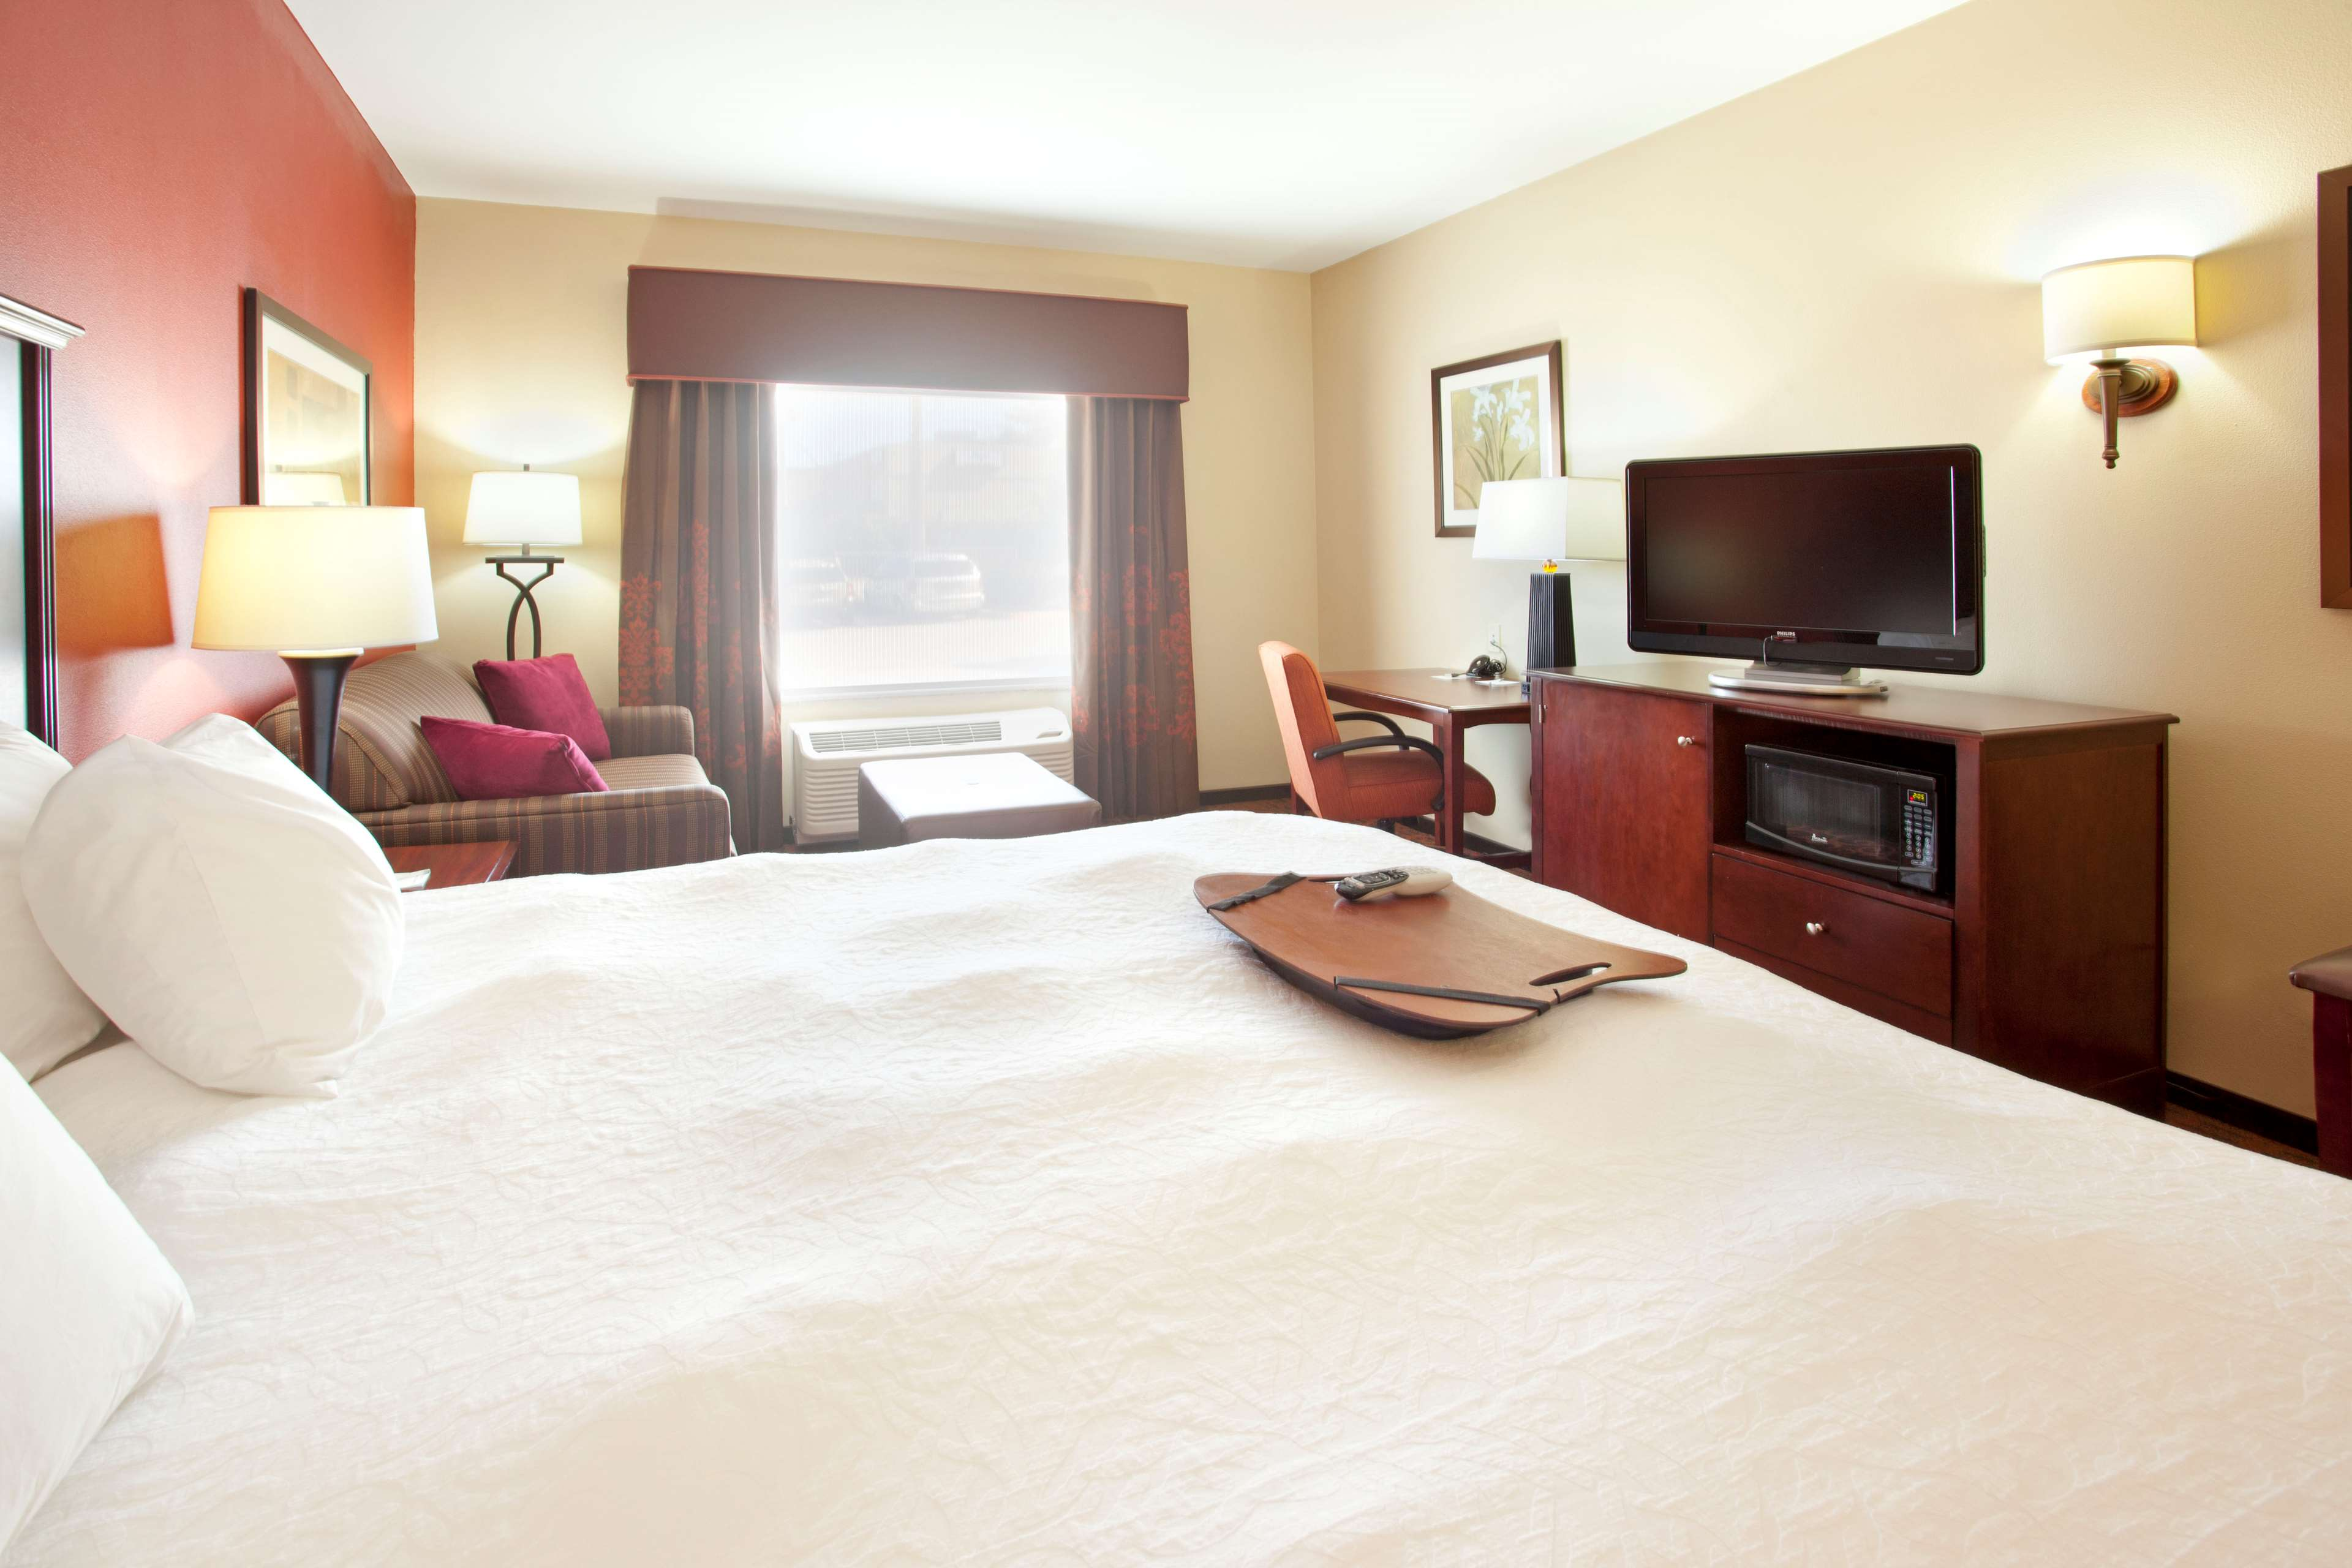 Hampton Inn & Suites Fort Worth-West-I-30 image 21